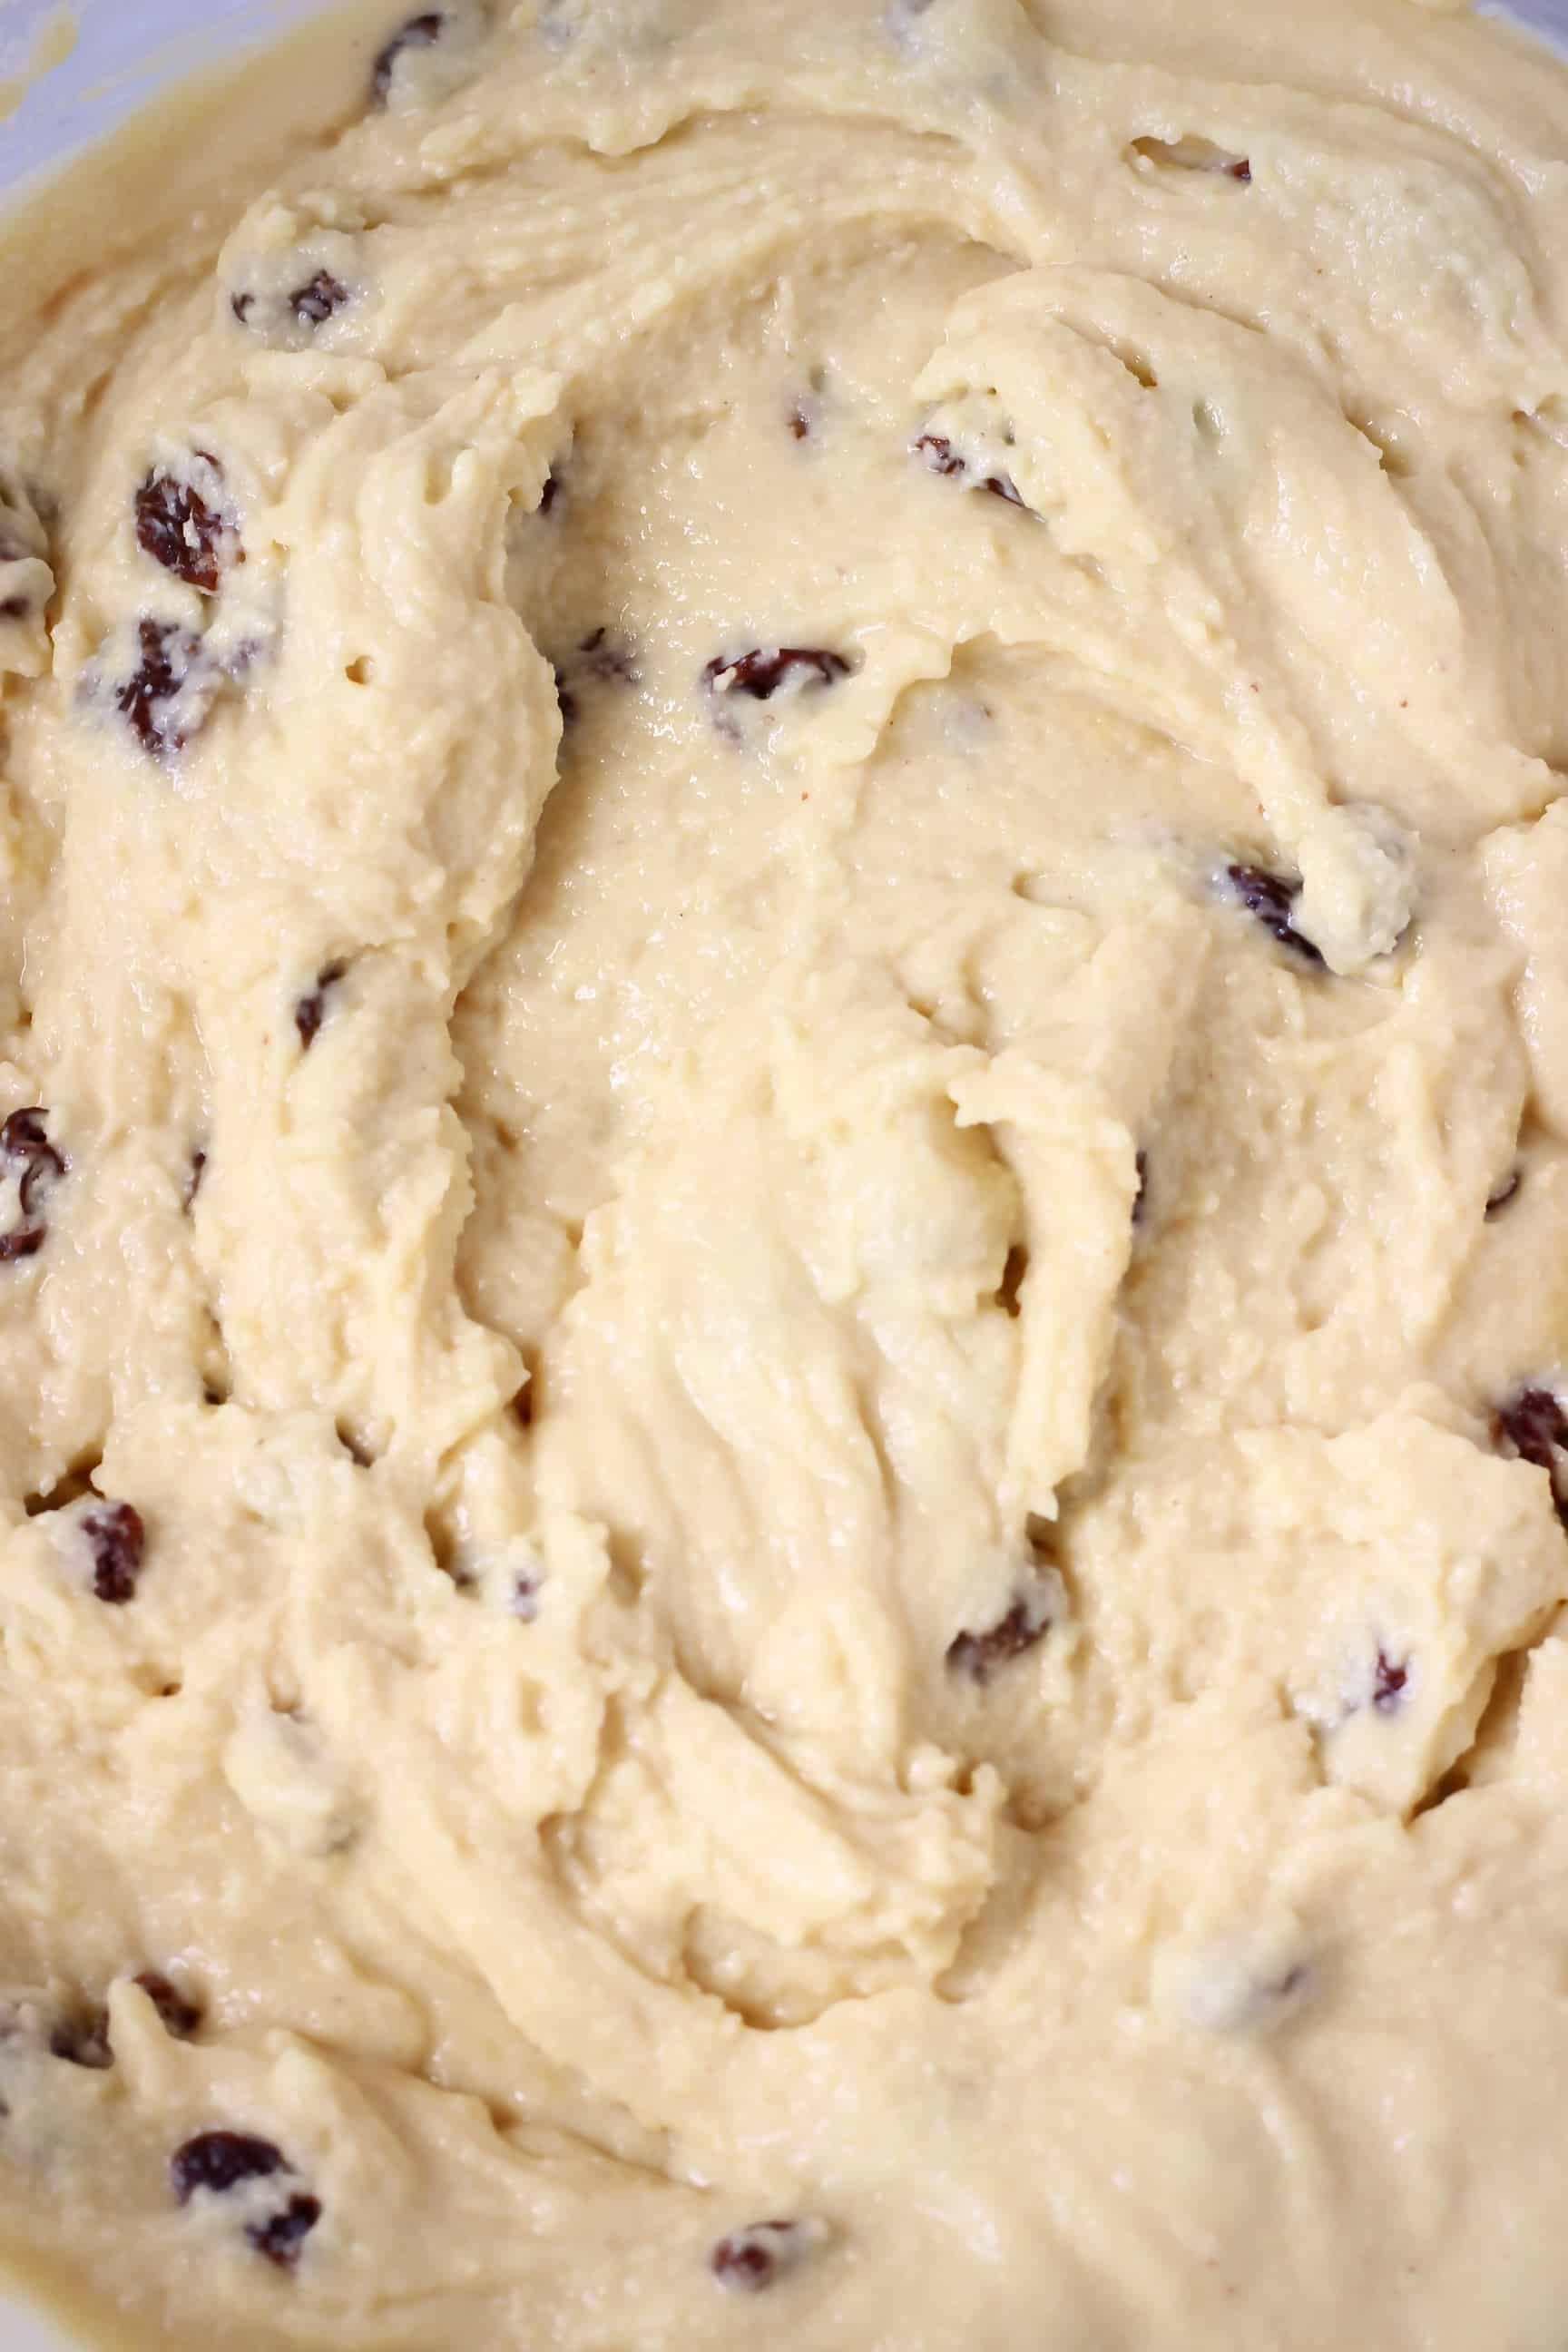 Gluten-Free Vegan Irish Soda Bread batter with raisins in a bowl